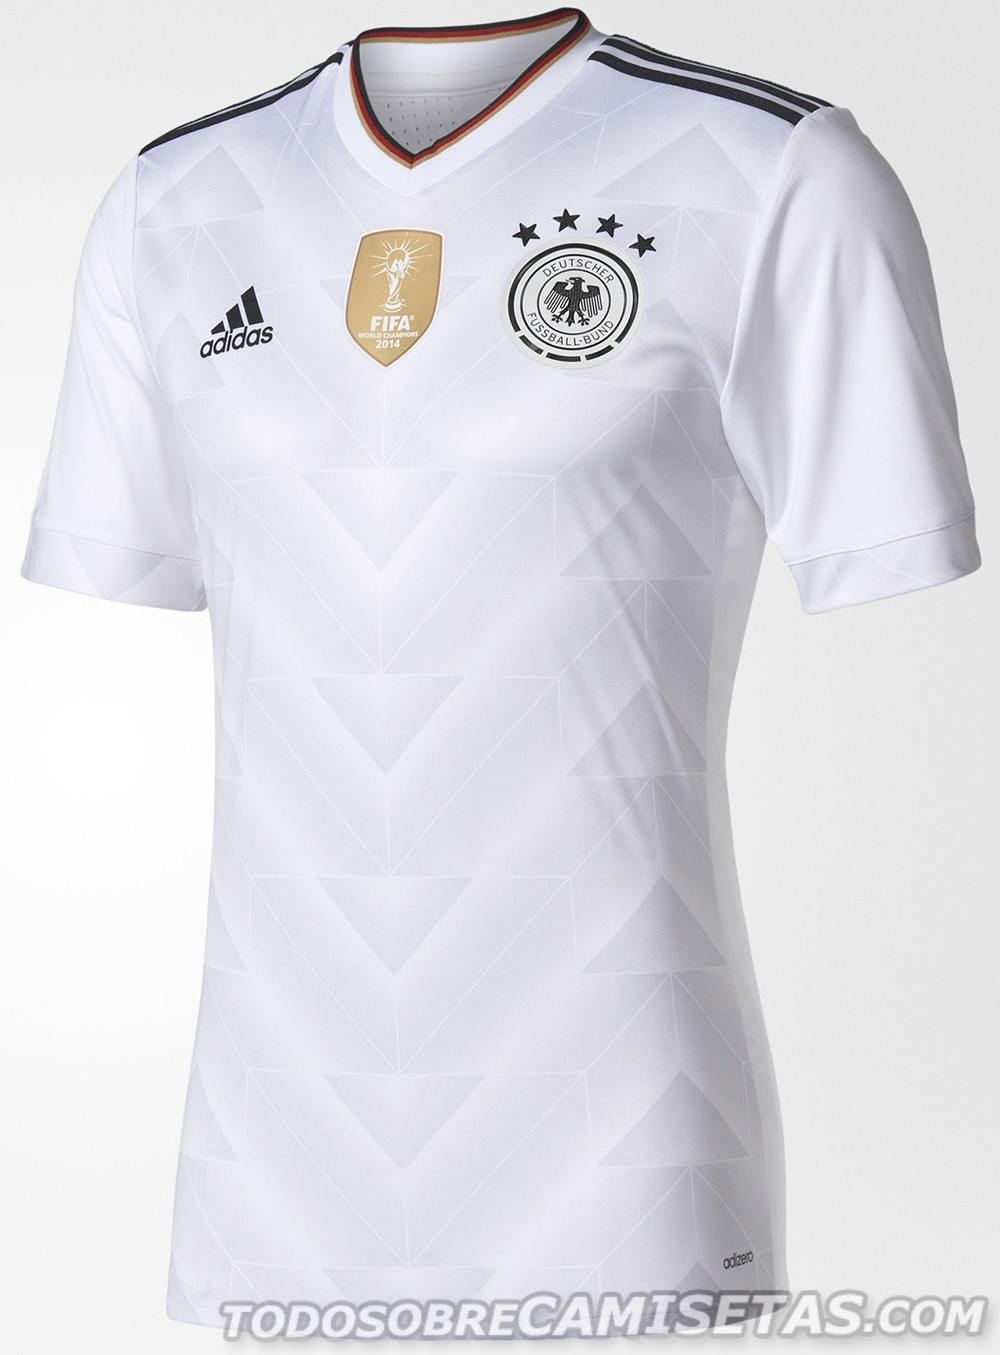 Germany-2017-18-adidas-new-home-kit-2.jpg